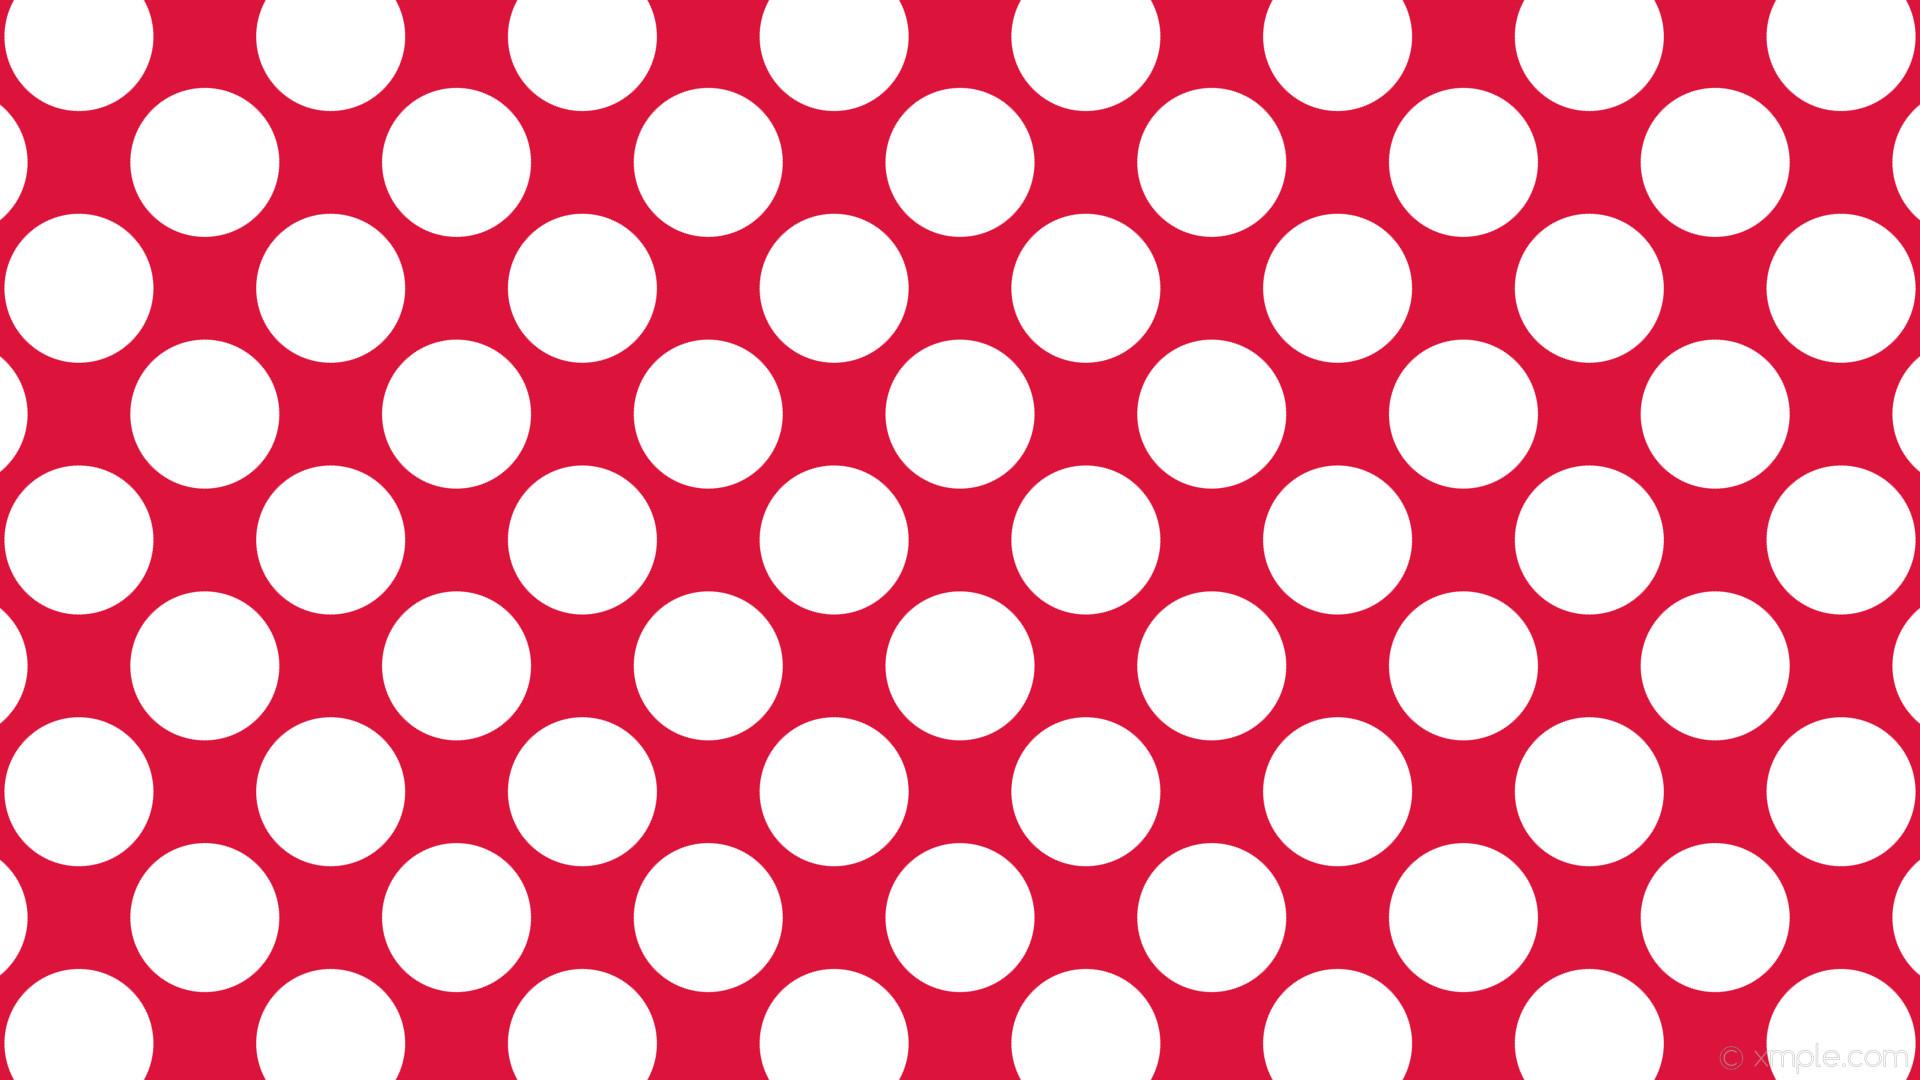 wallpaper red polka dots white spots crimson #dc143c #ffffff 315° 149px  178px